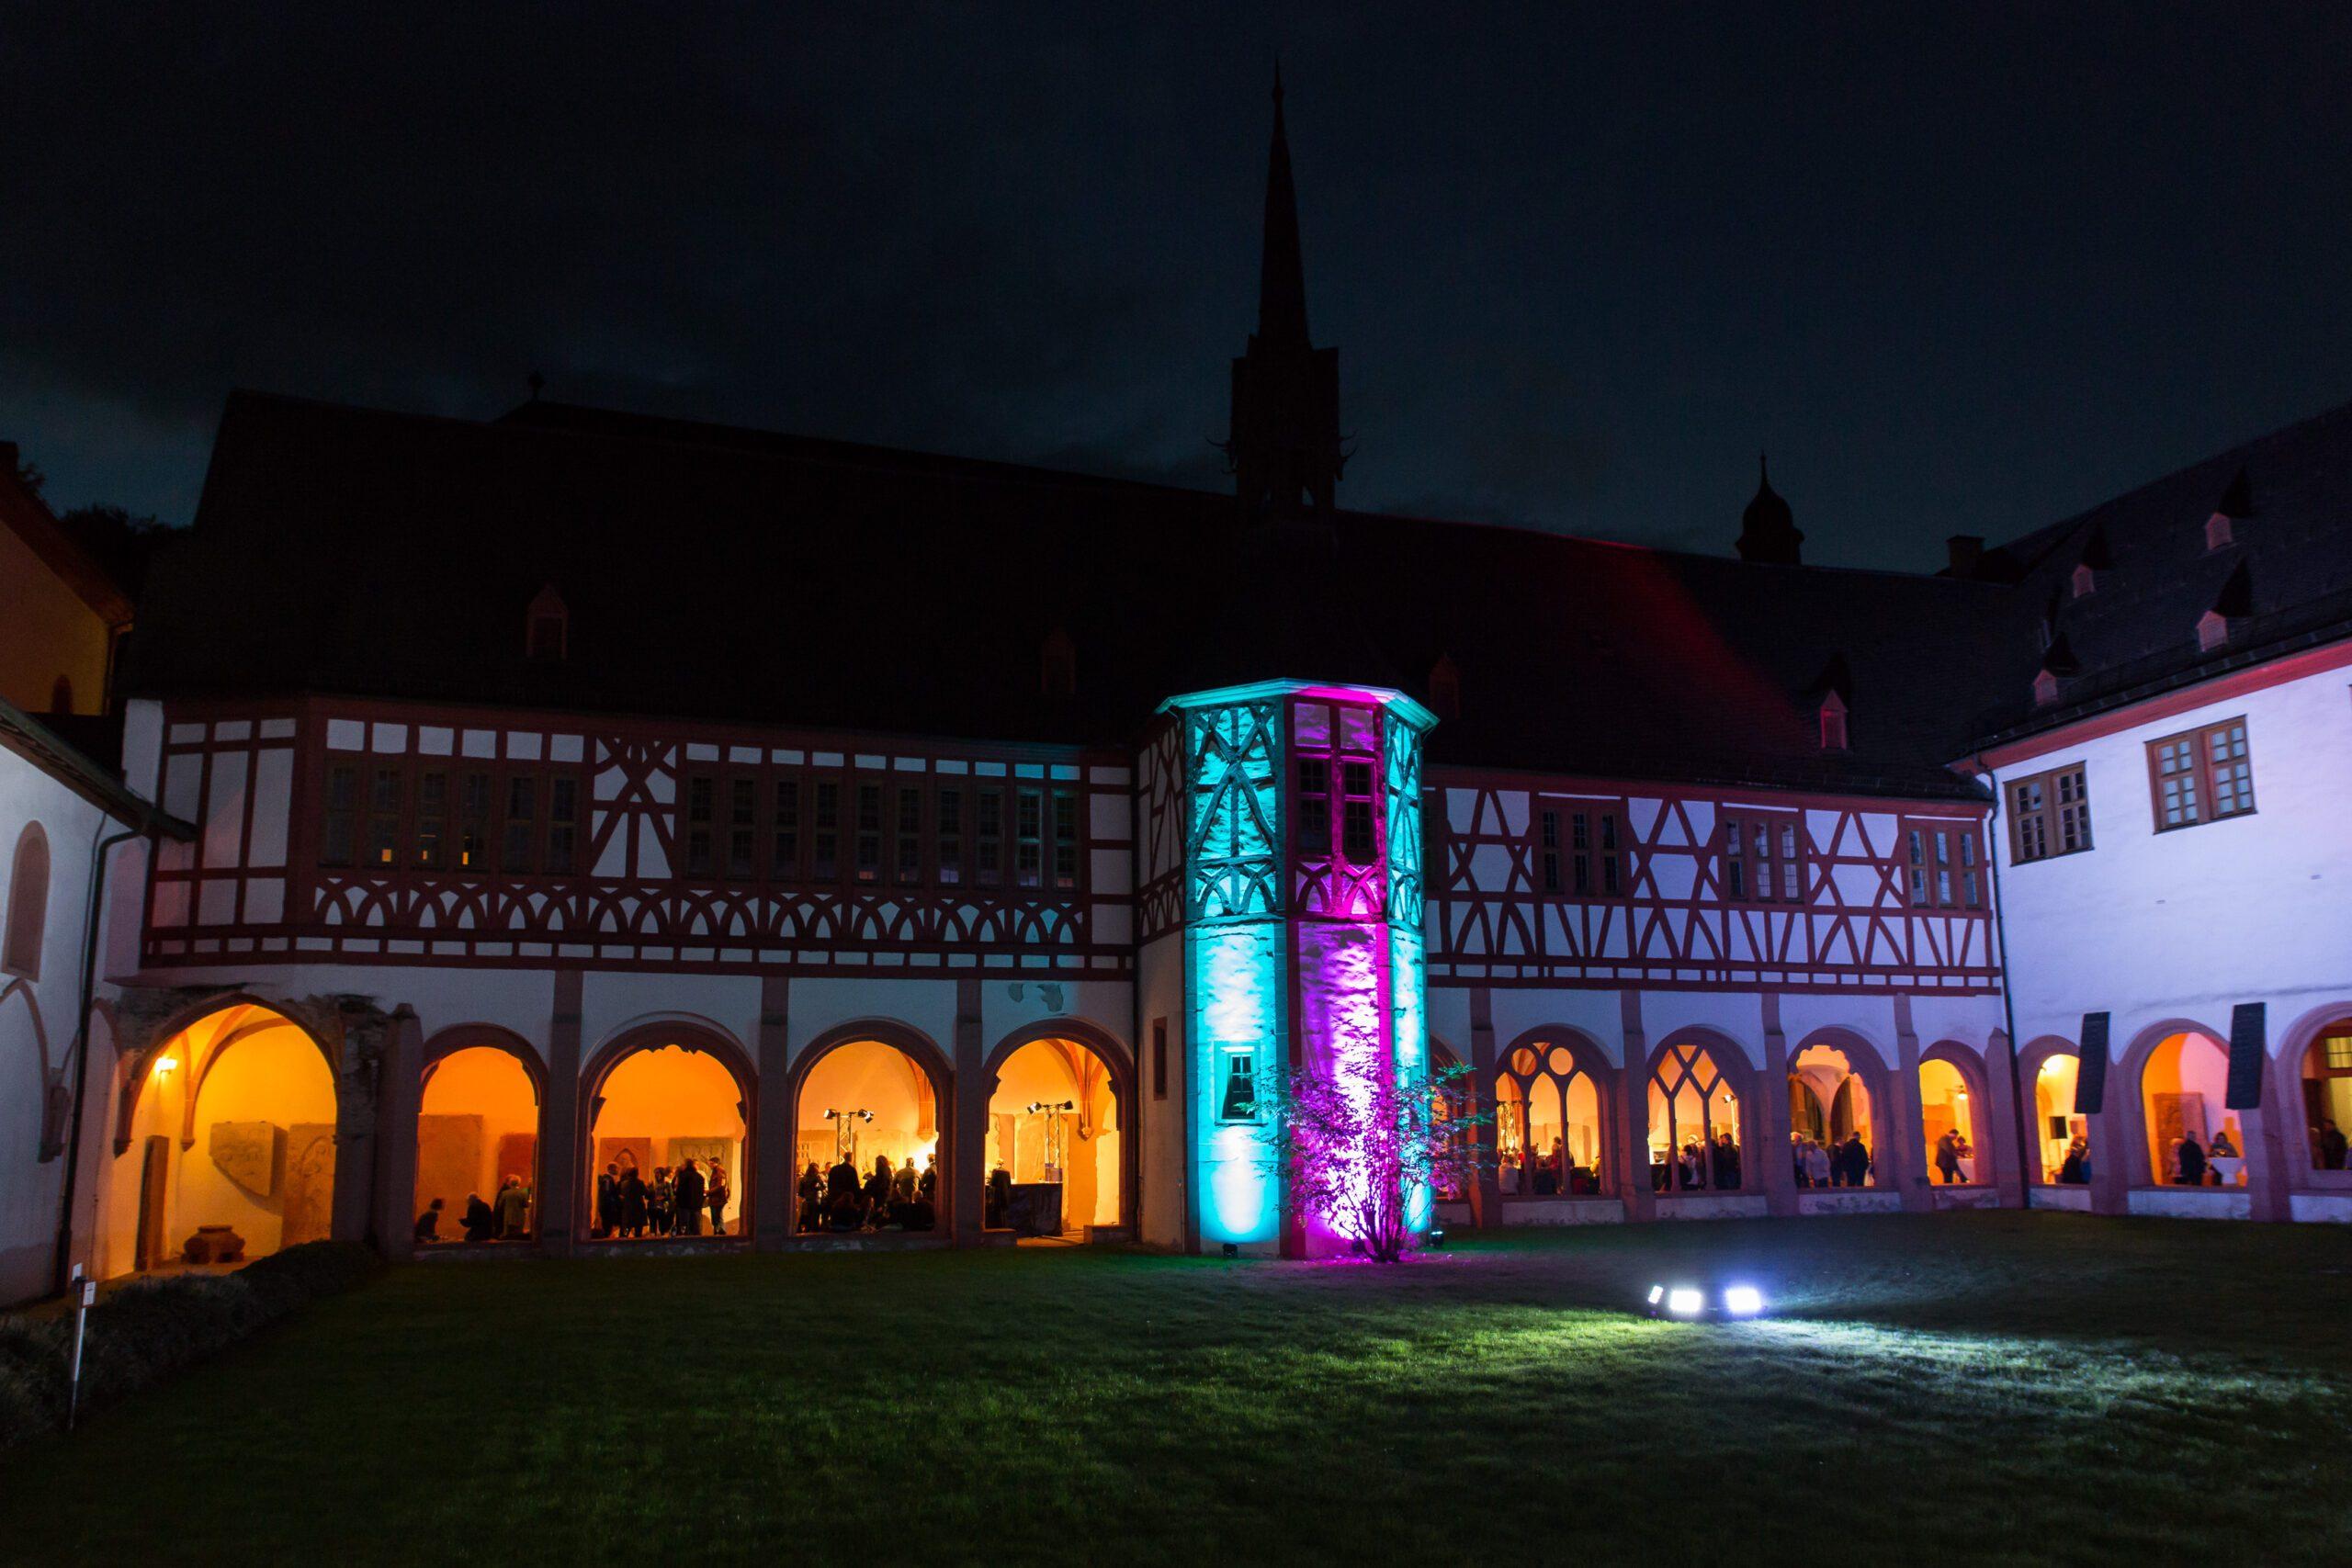 Jörg Schellschmidt - Eventfotografie - Lumostory Kloster Eberbach 2014